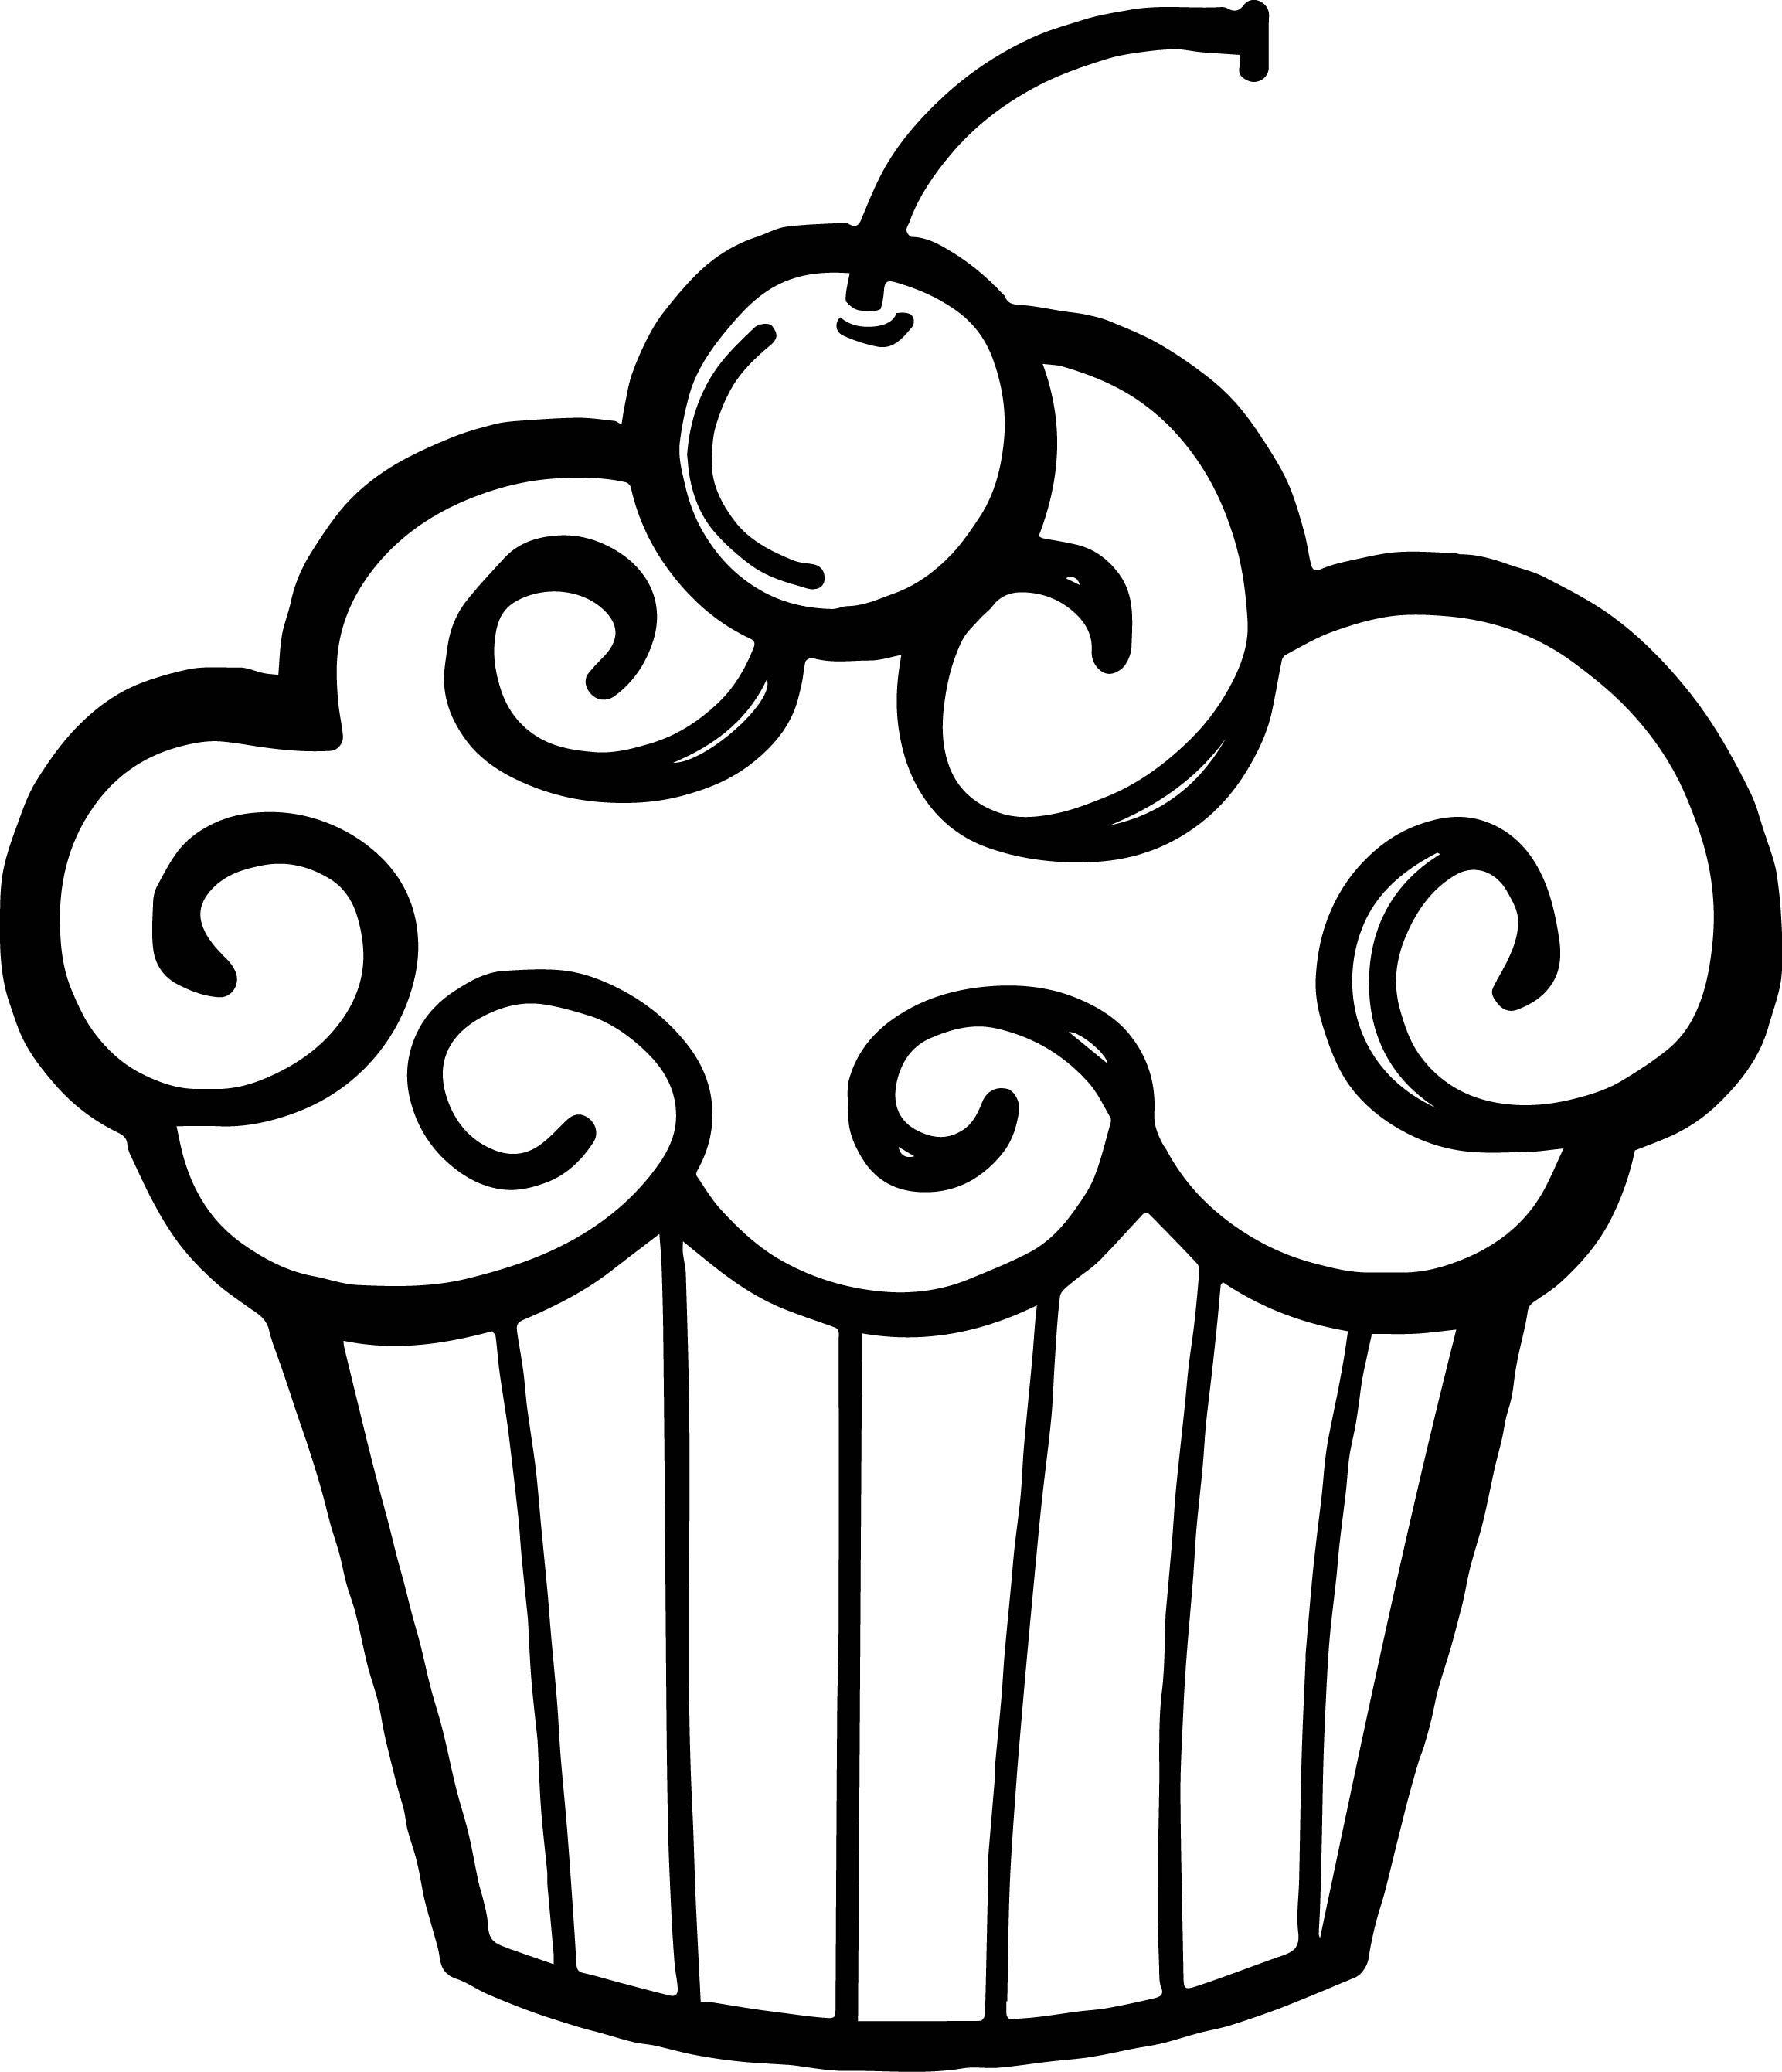 Cupcake clipart four. Pin by annelanie venter